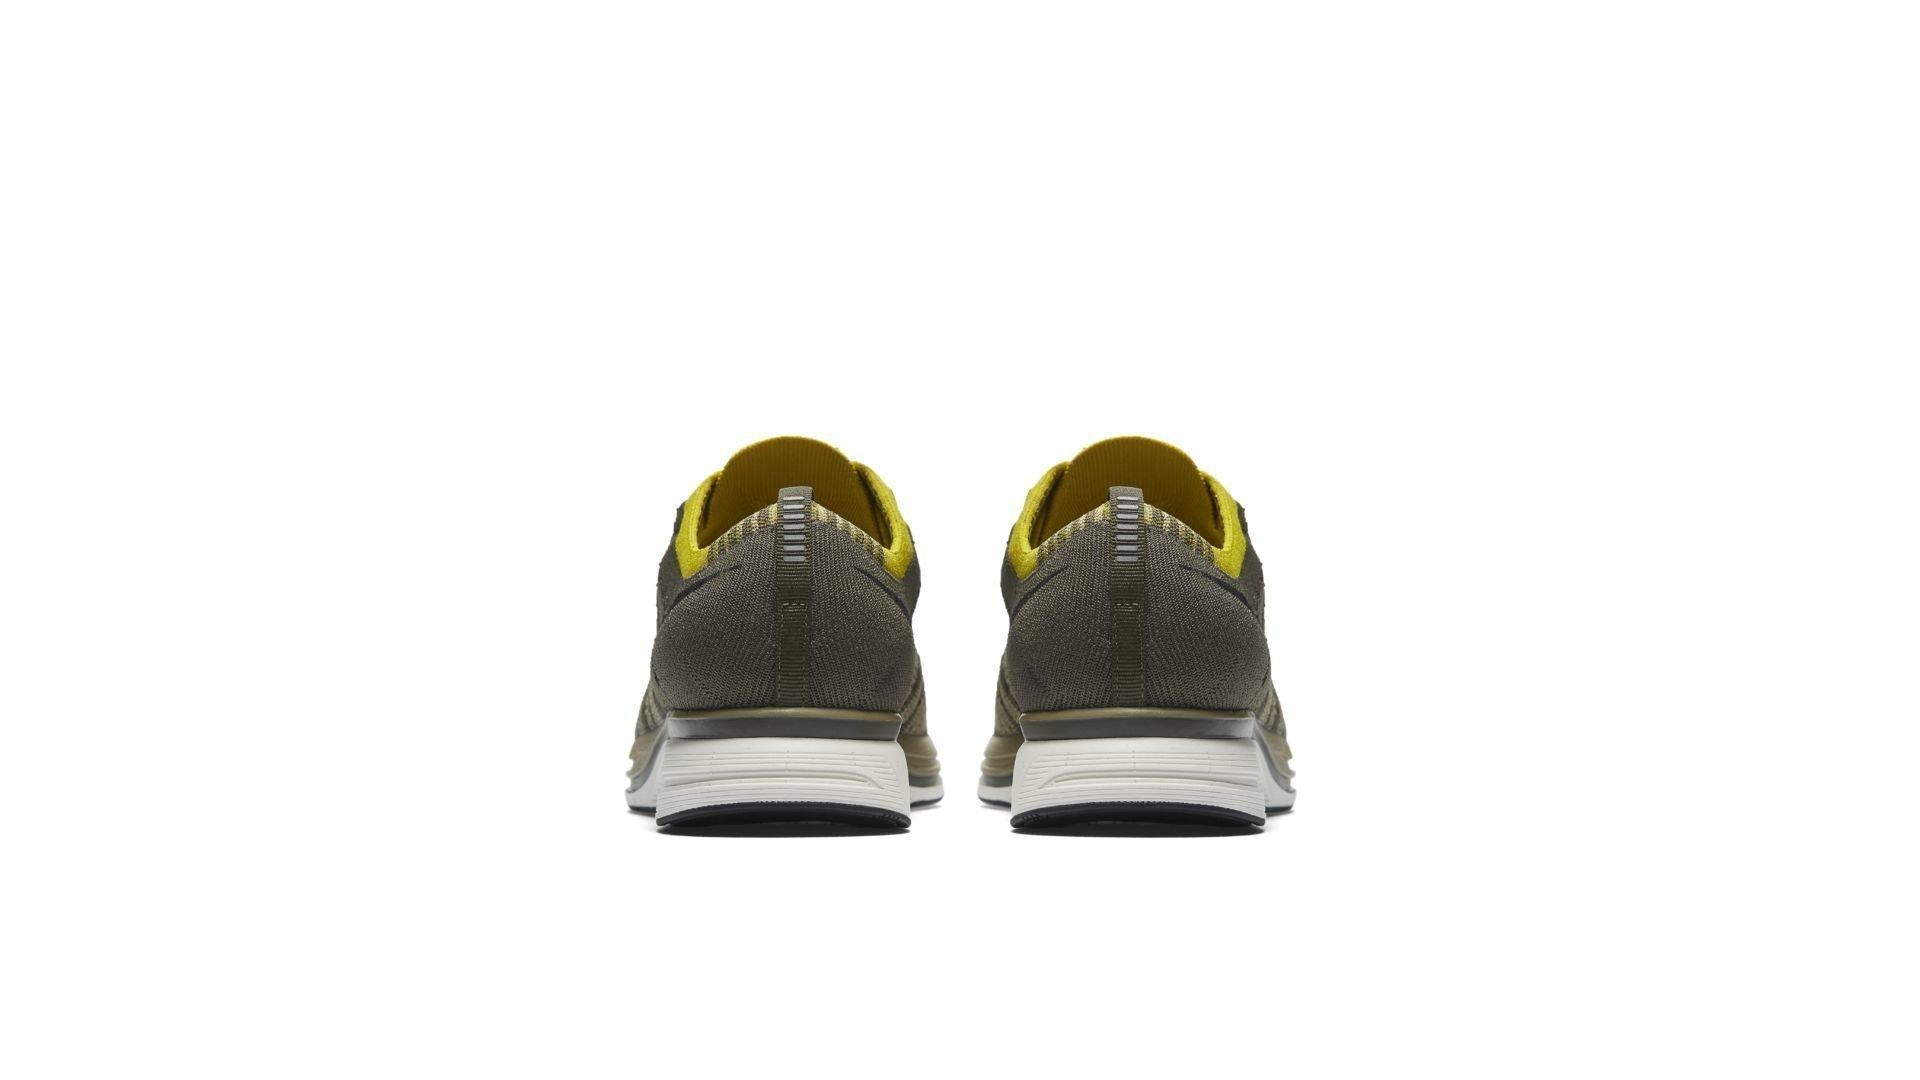 Nike Flyknit Trainer Cargo Khaki Bright Citron (AH8396-300)